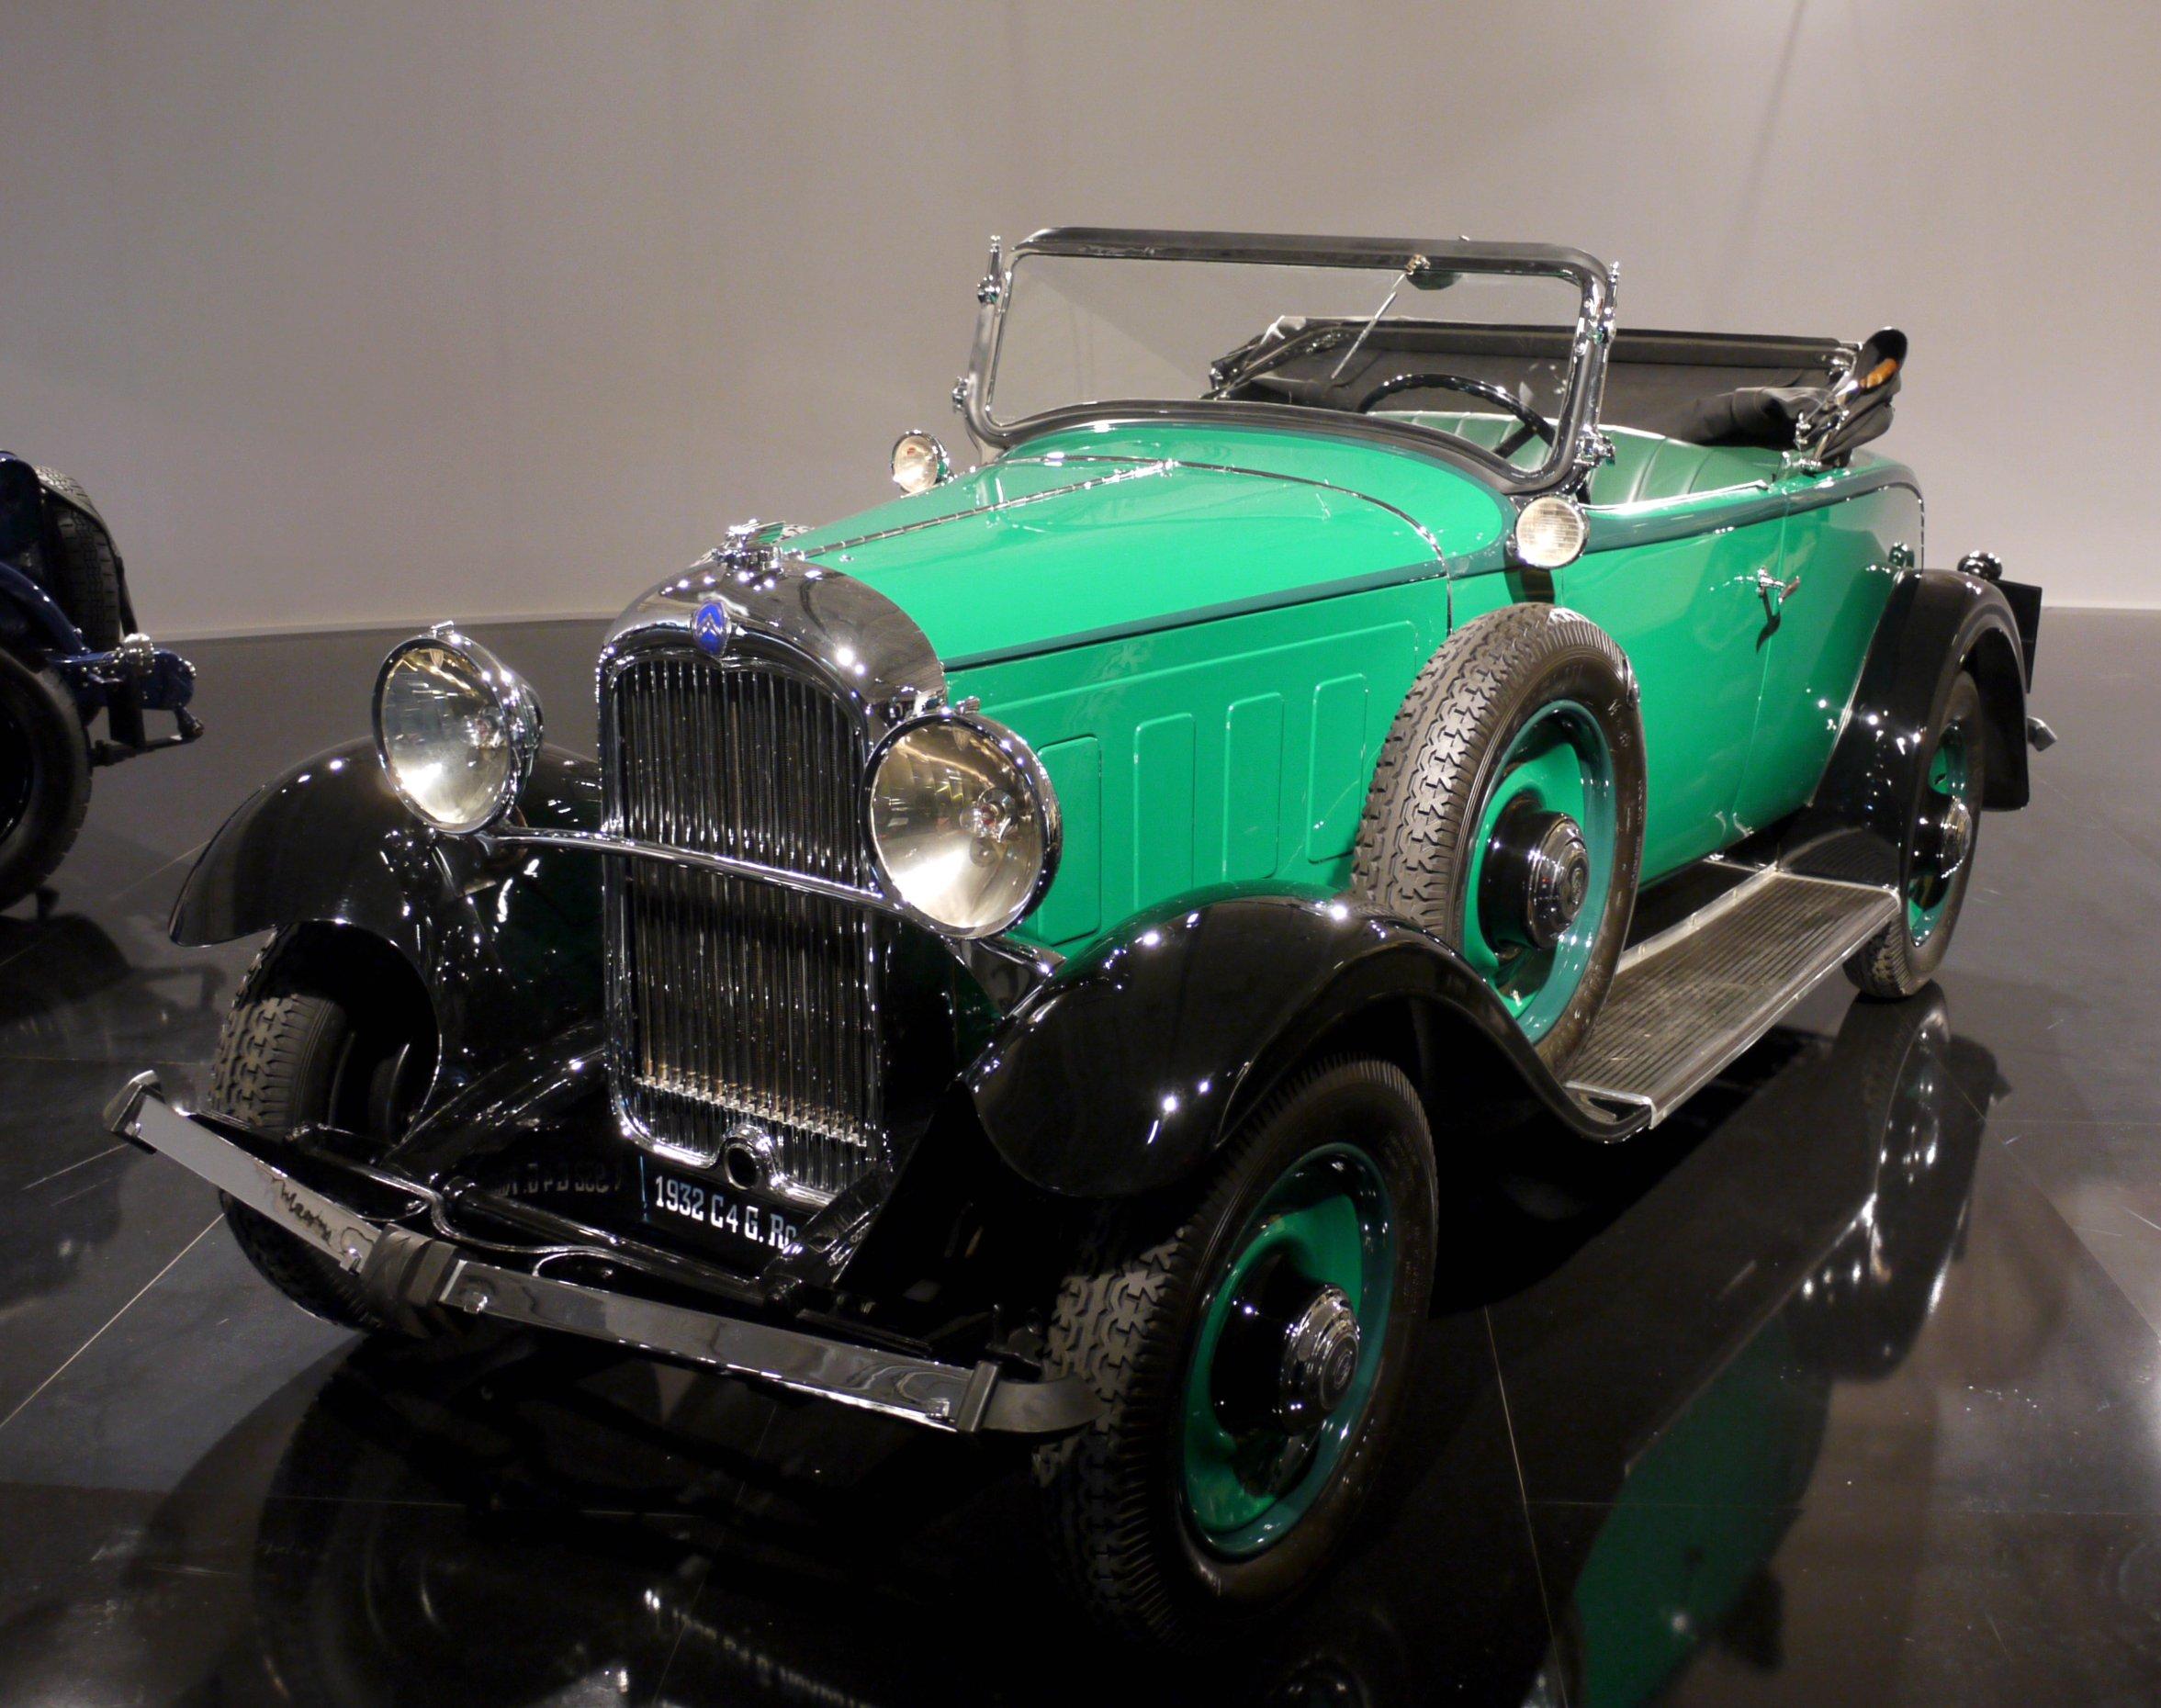 datei mondial de l 39 automobile 2010 paris france 5059047014 jpg wikipedia. Black Bedroom Furniture Sets. Home Design Ideas